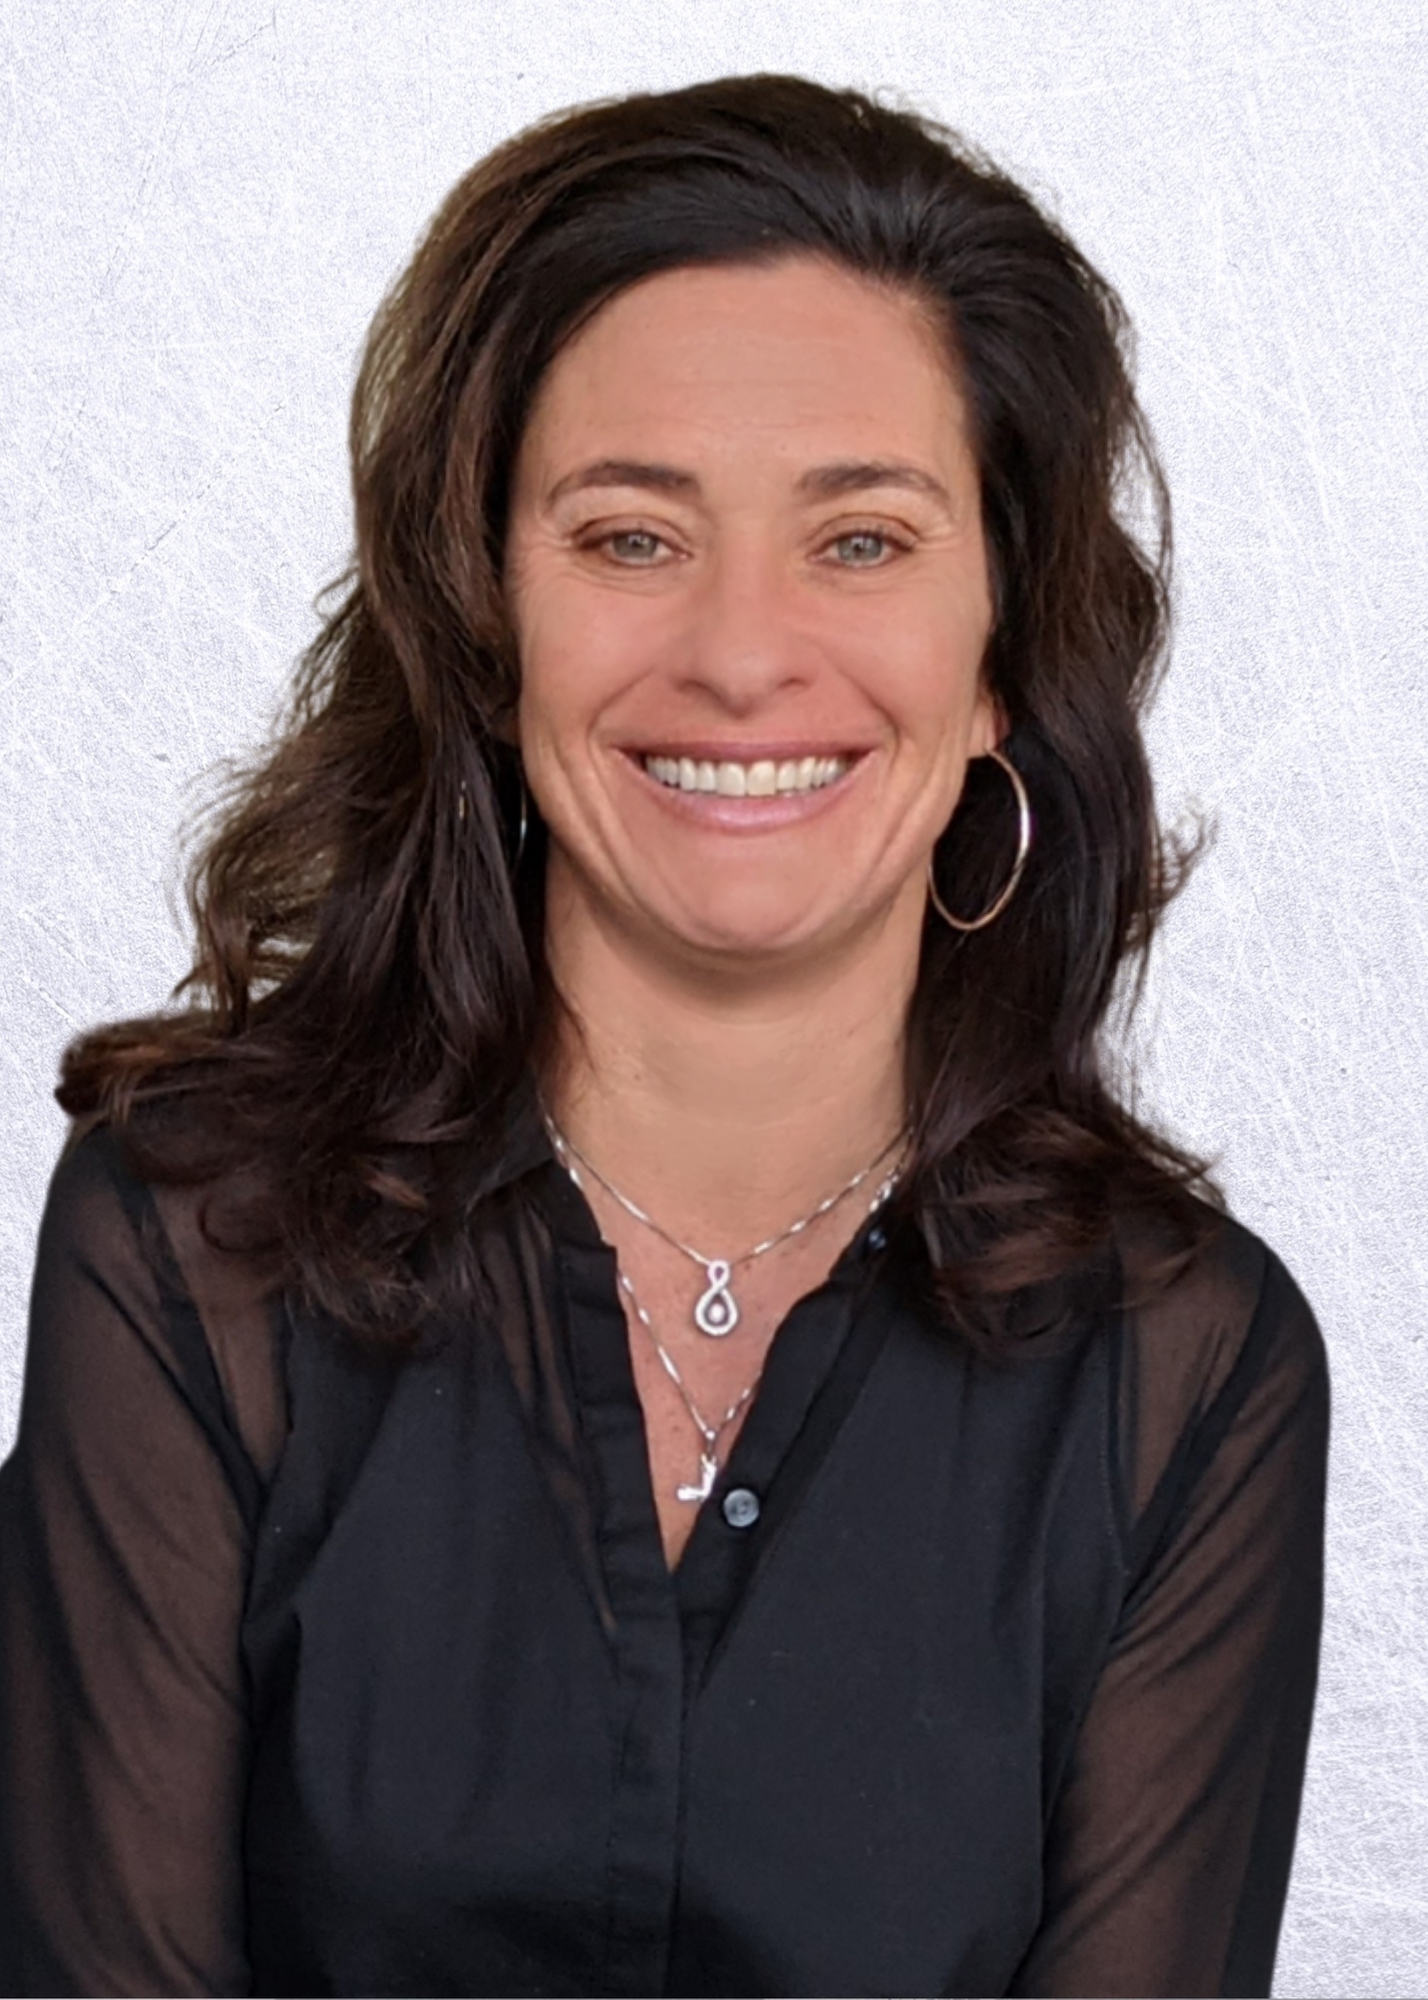 Gina Hogan